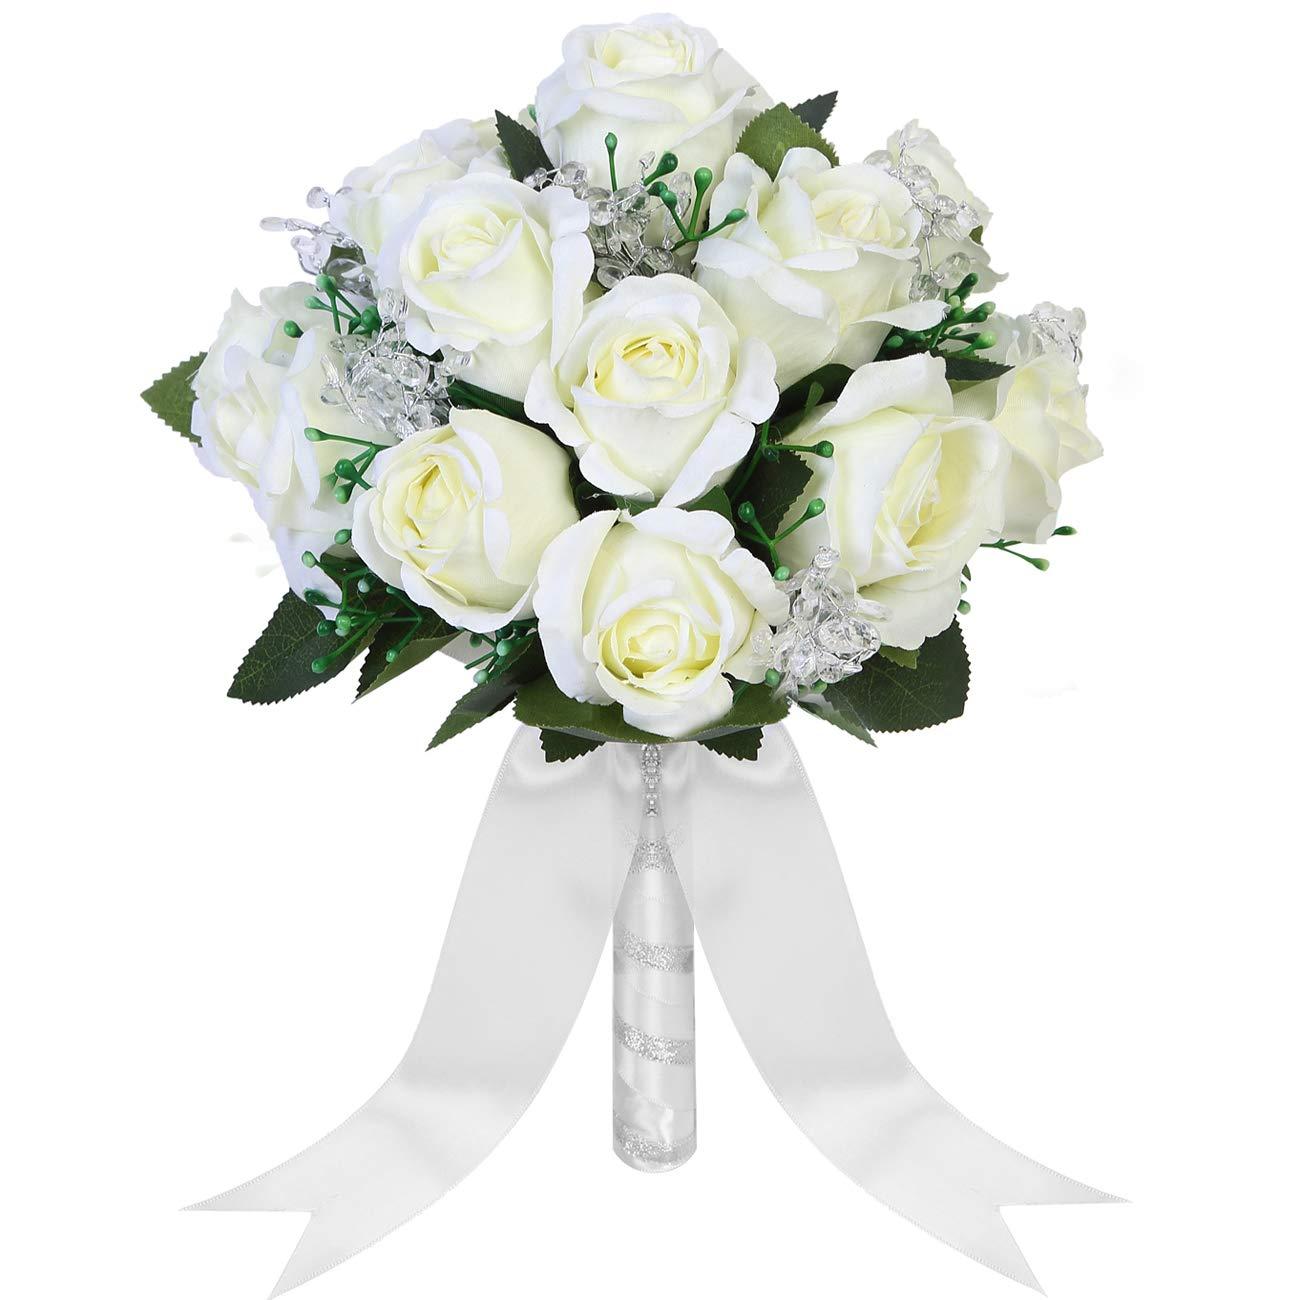 Silk Flowers Wedding Bouquets.Aivanart Wedding Bouquet Crystal Silk Roses Bridal Wedding Hand Bouquet Bridesmaid Holding Artificial Fake Flowers